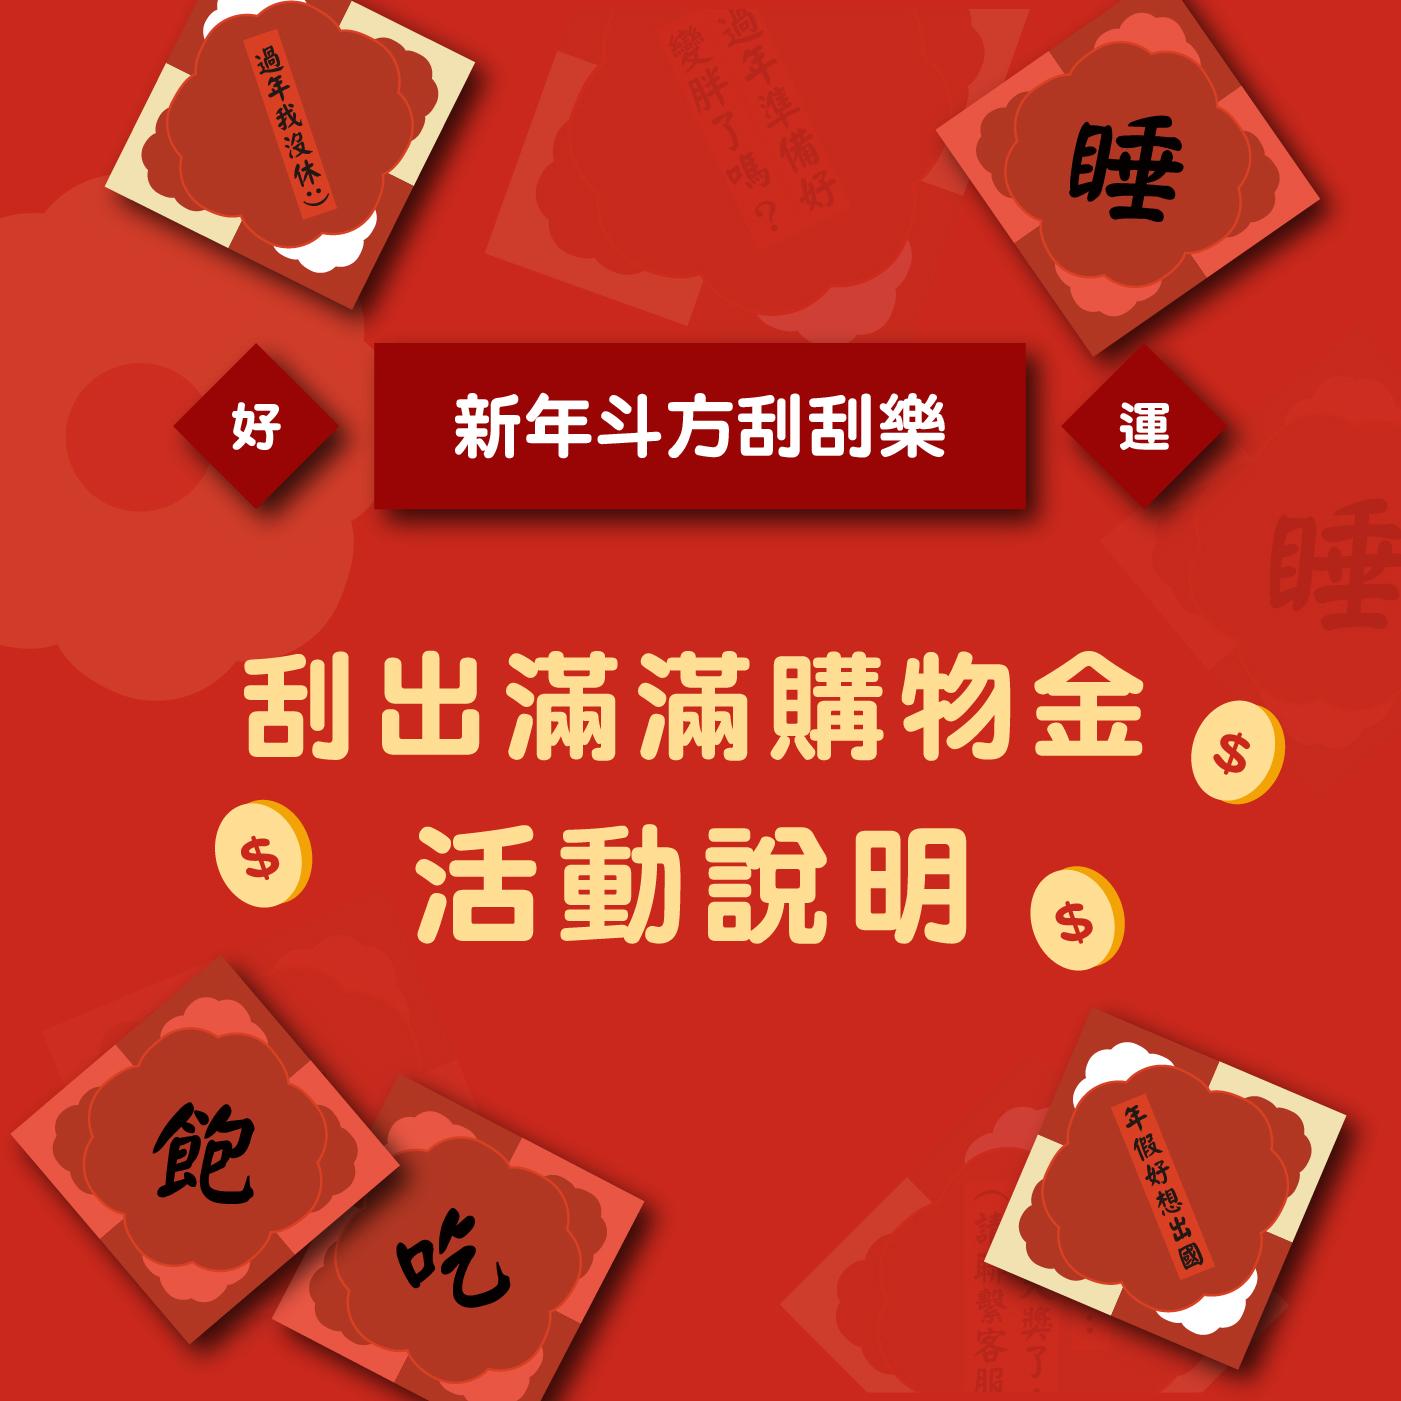 TAIWANESE NEW YEAR 新年快樂斗方刮刮樂